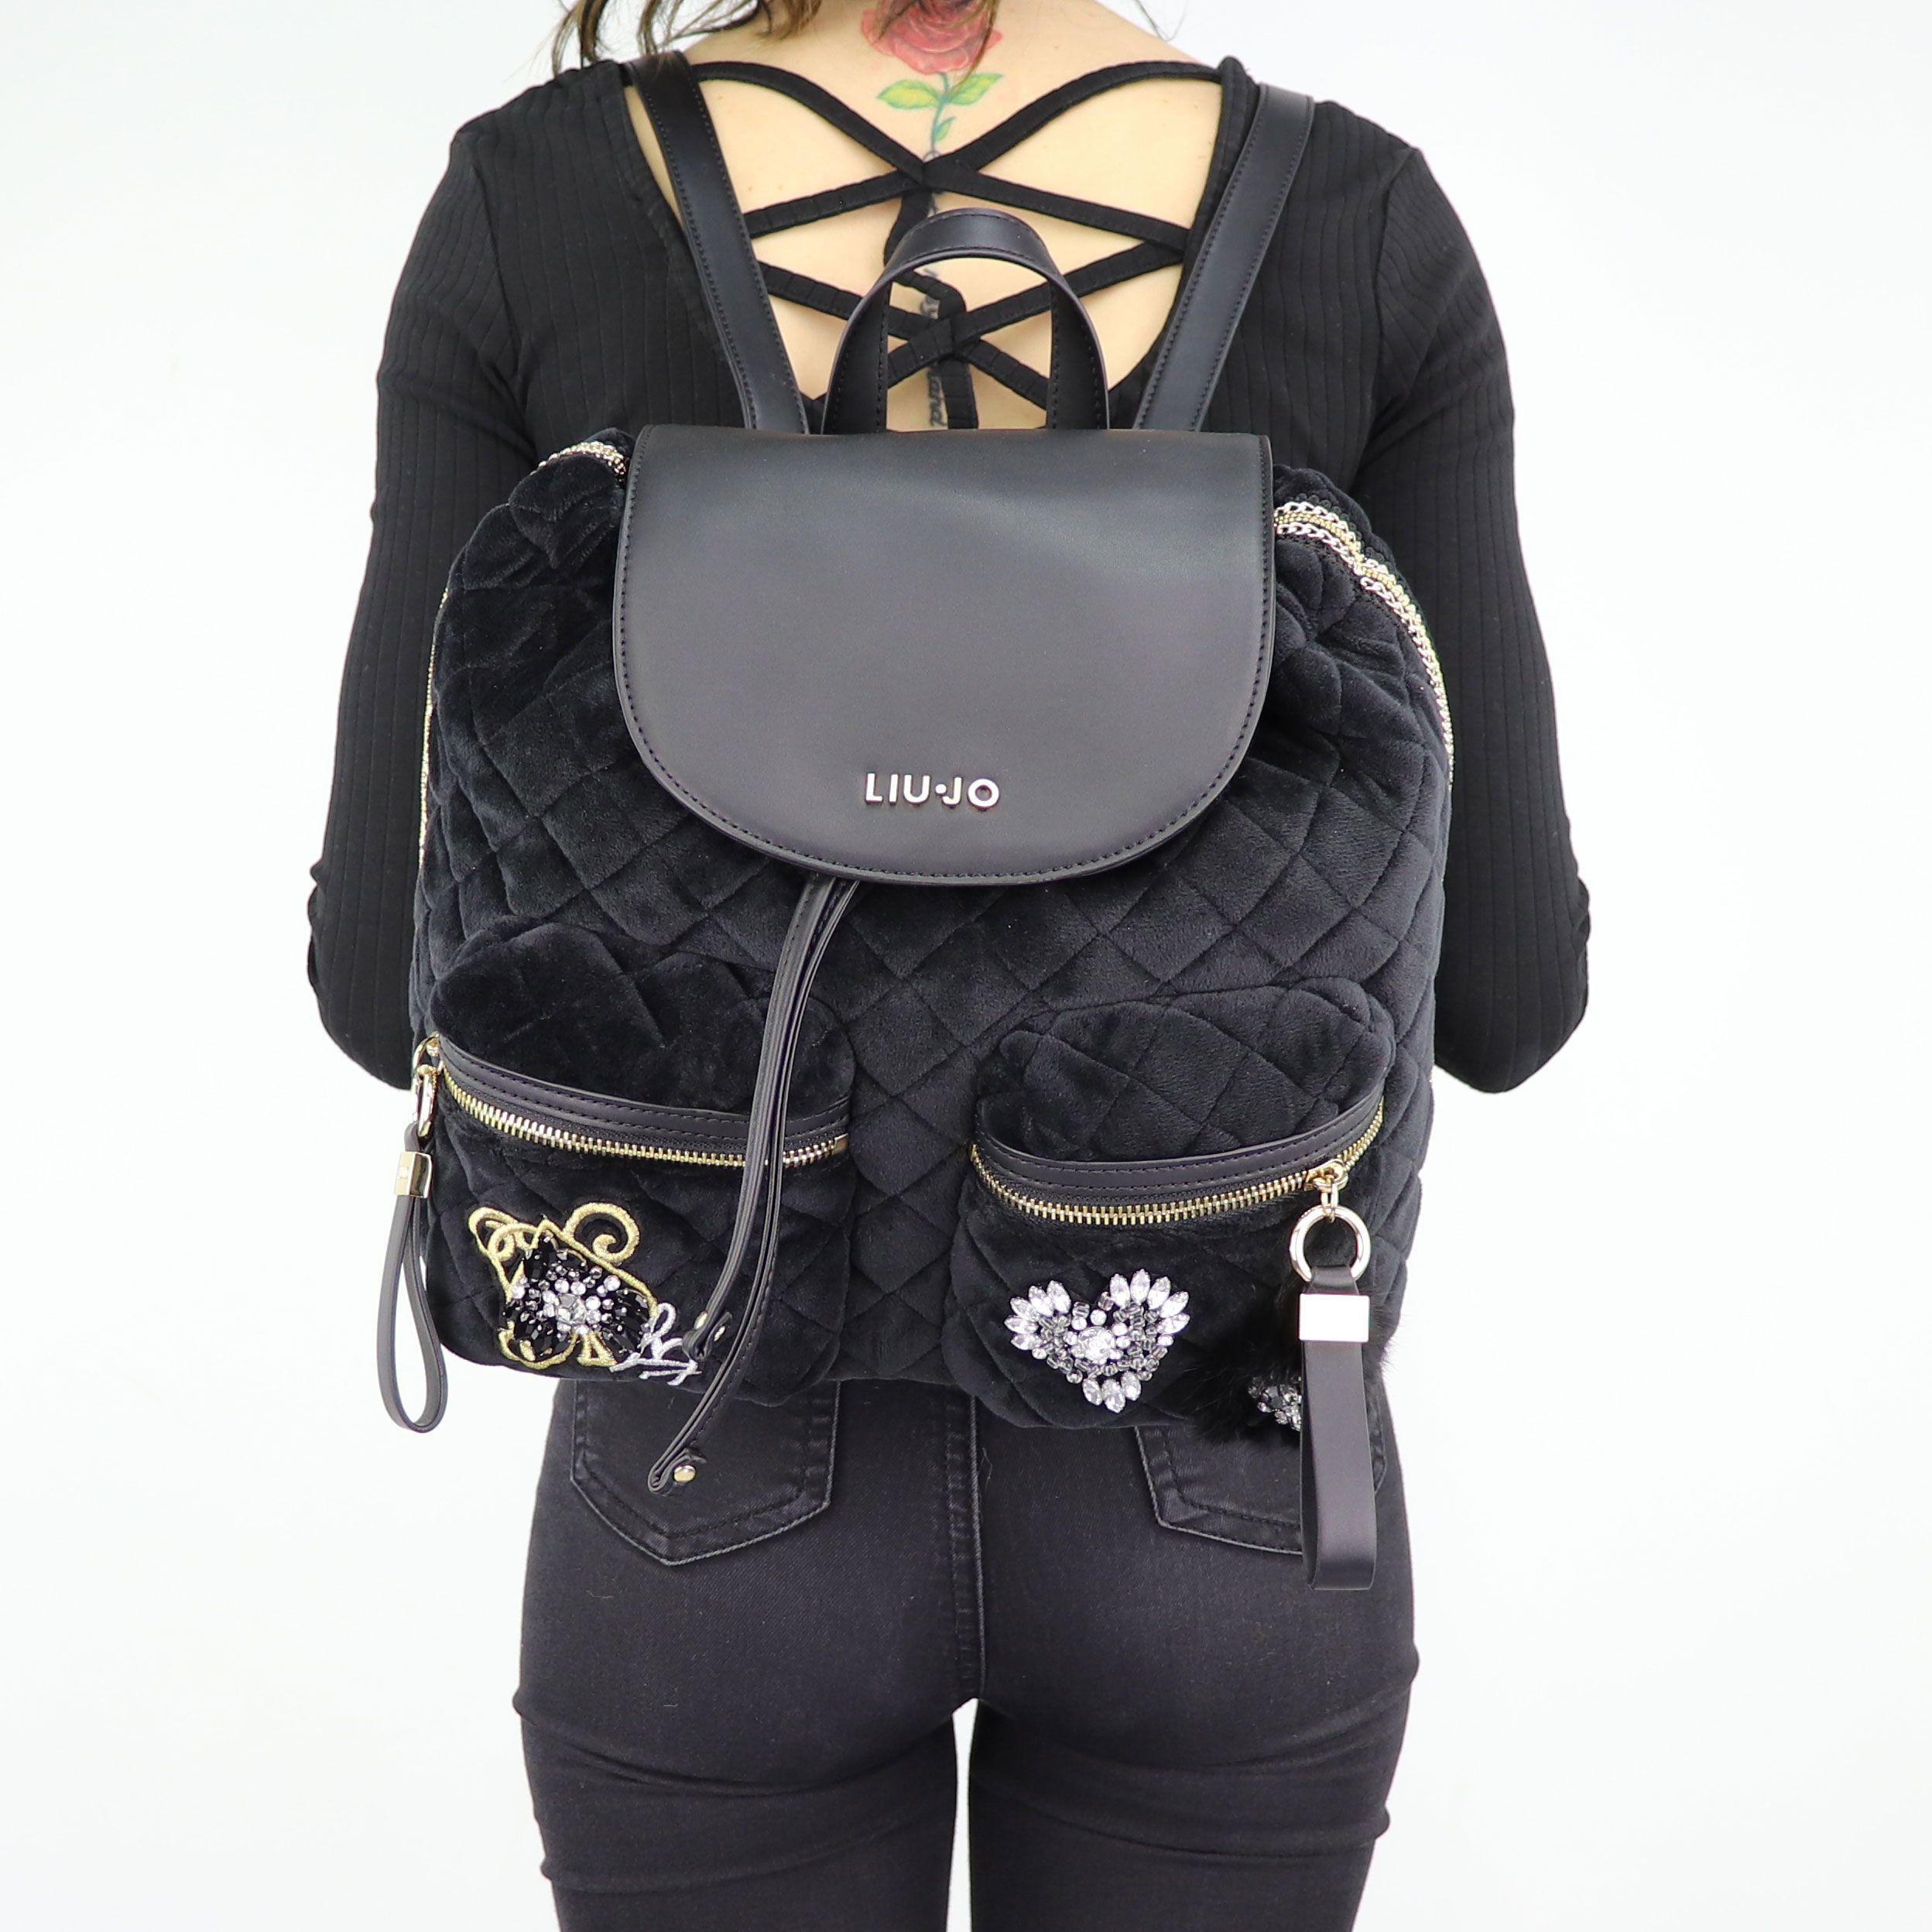 Backpack Liu Jo black velvet Brenta N68062 T9093 In More